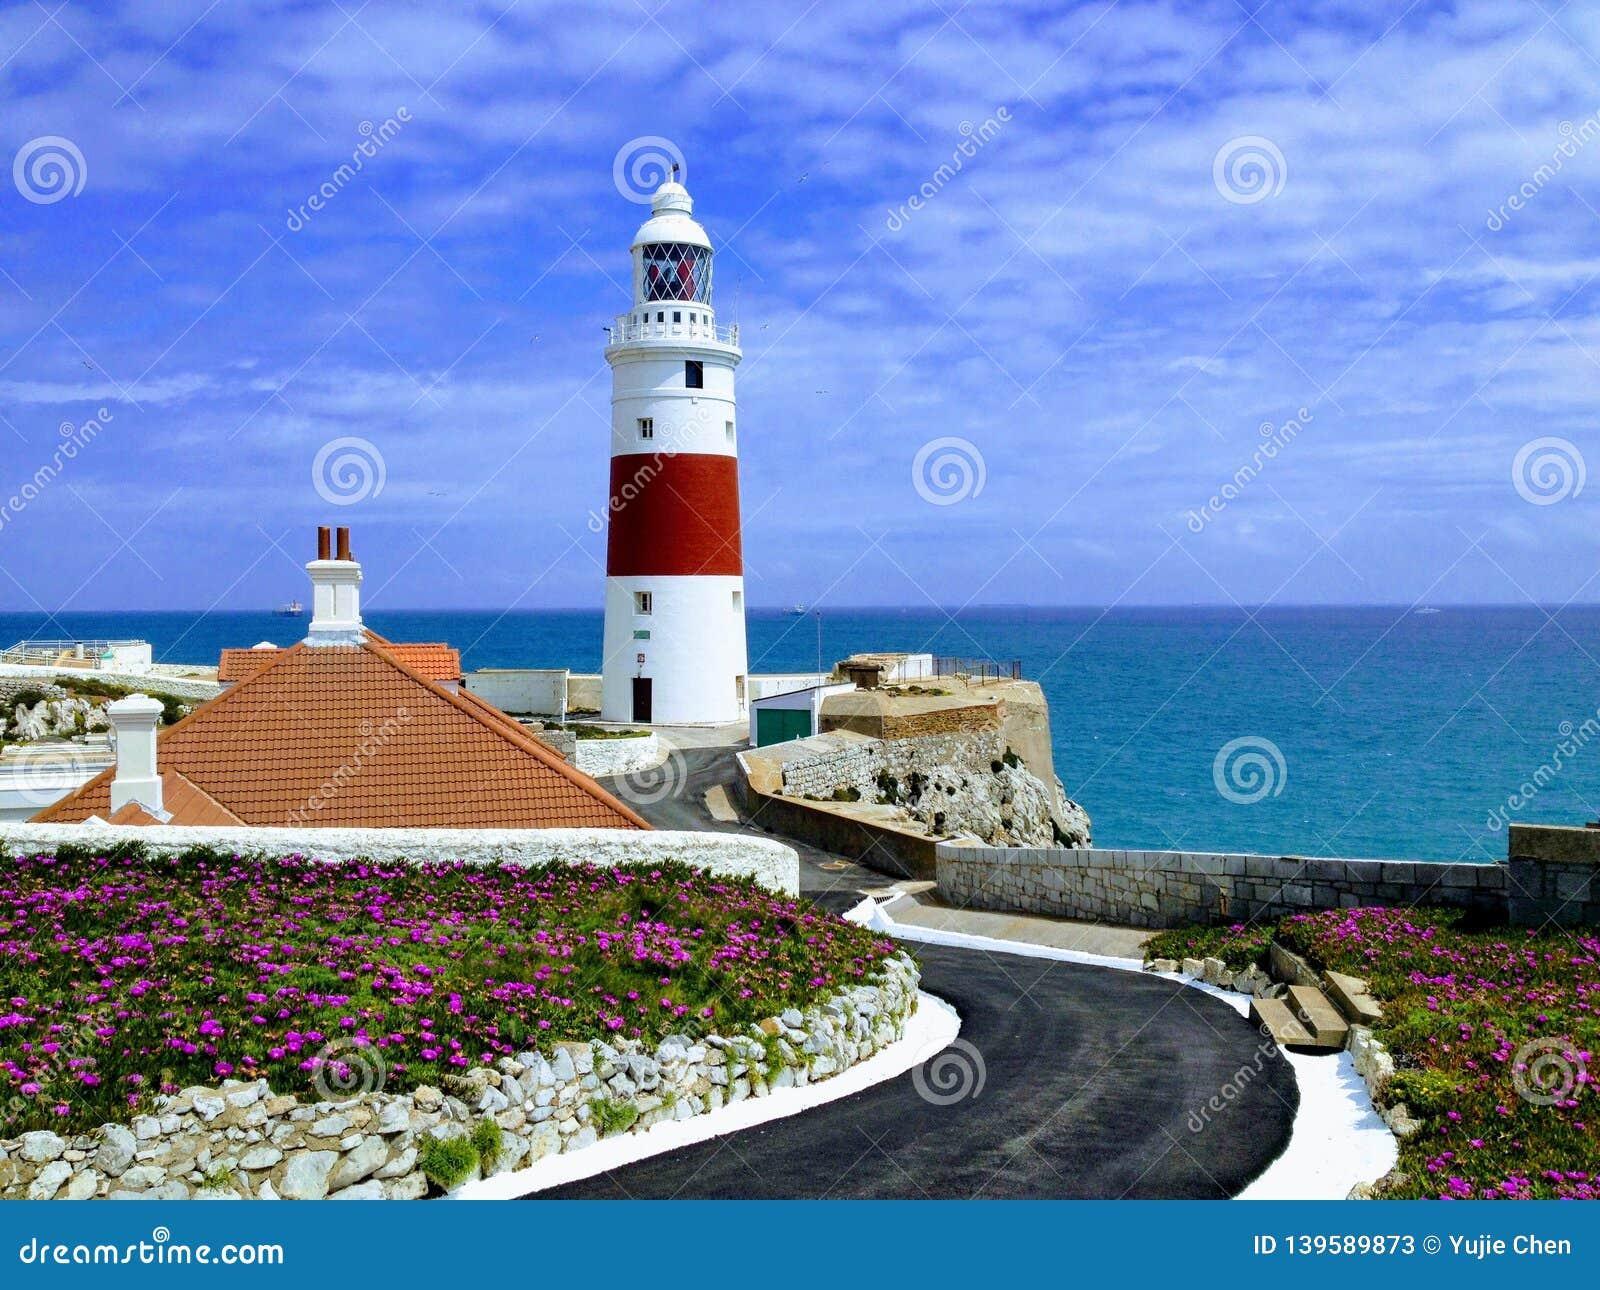 Lighthouse at Europe point, Gibraltar